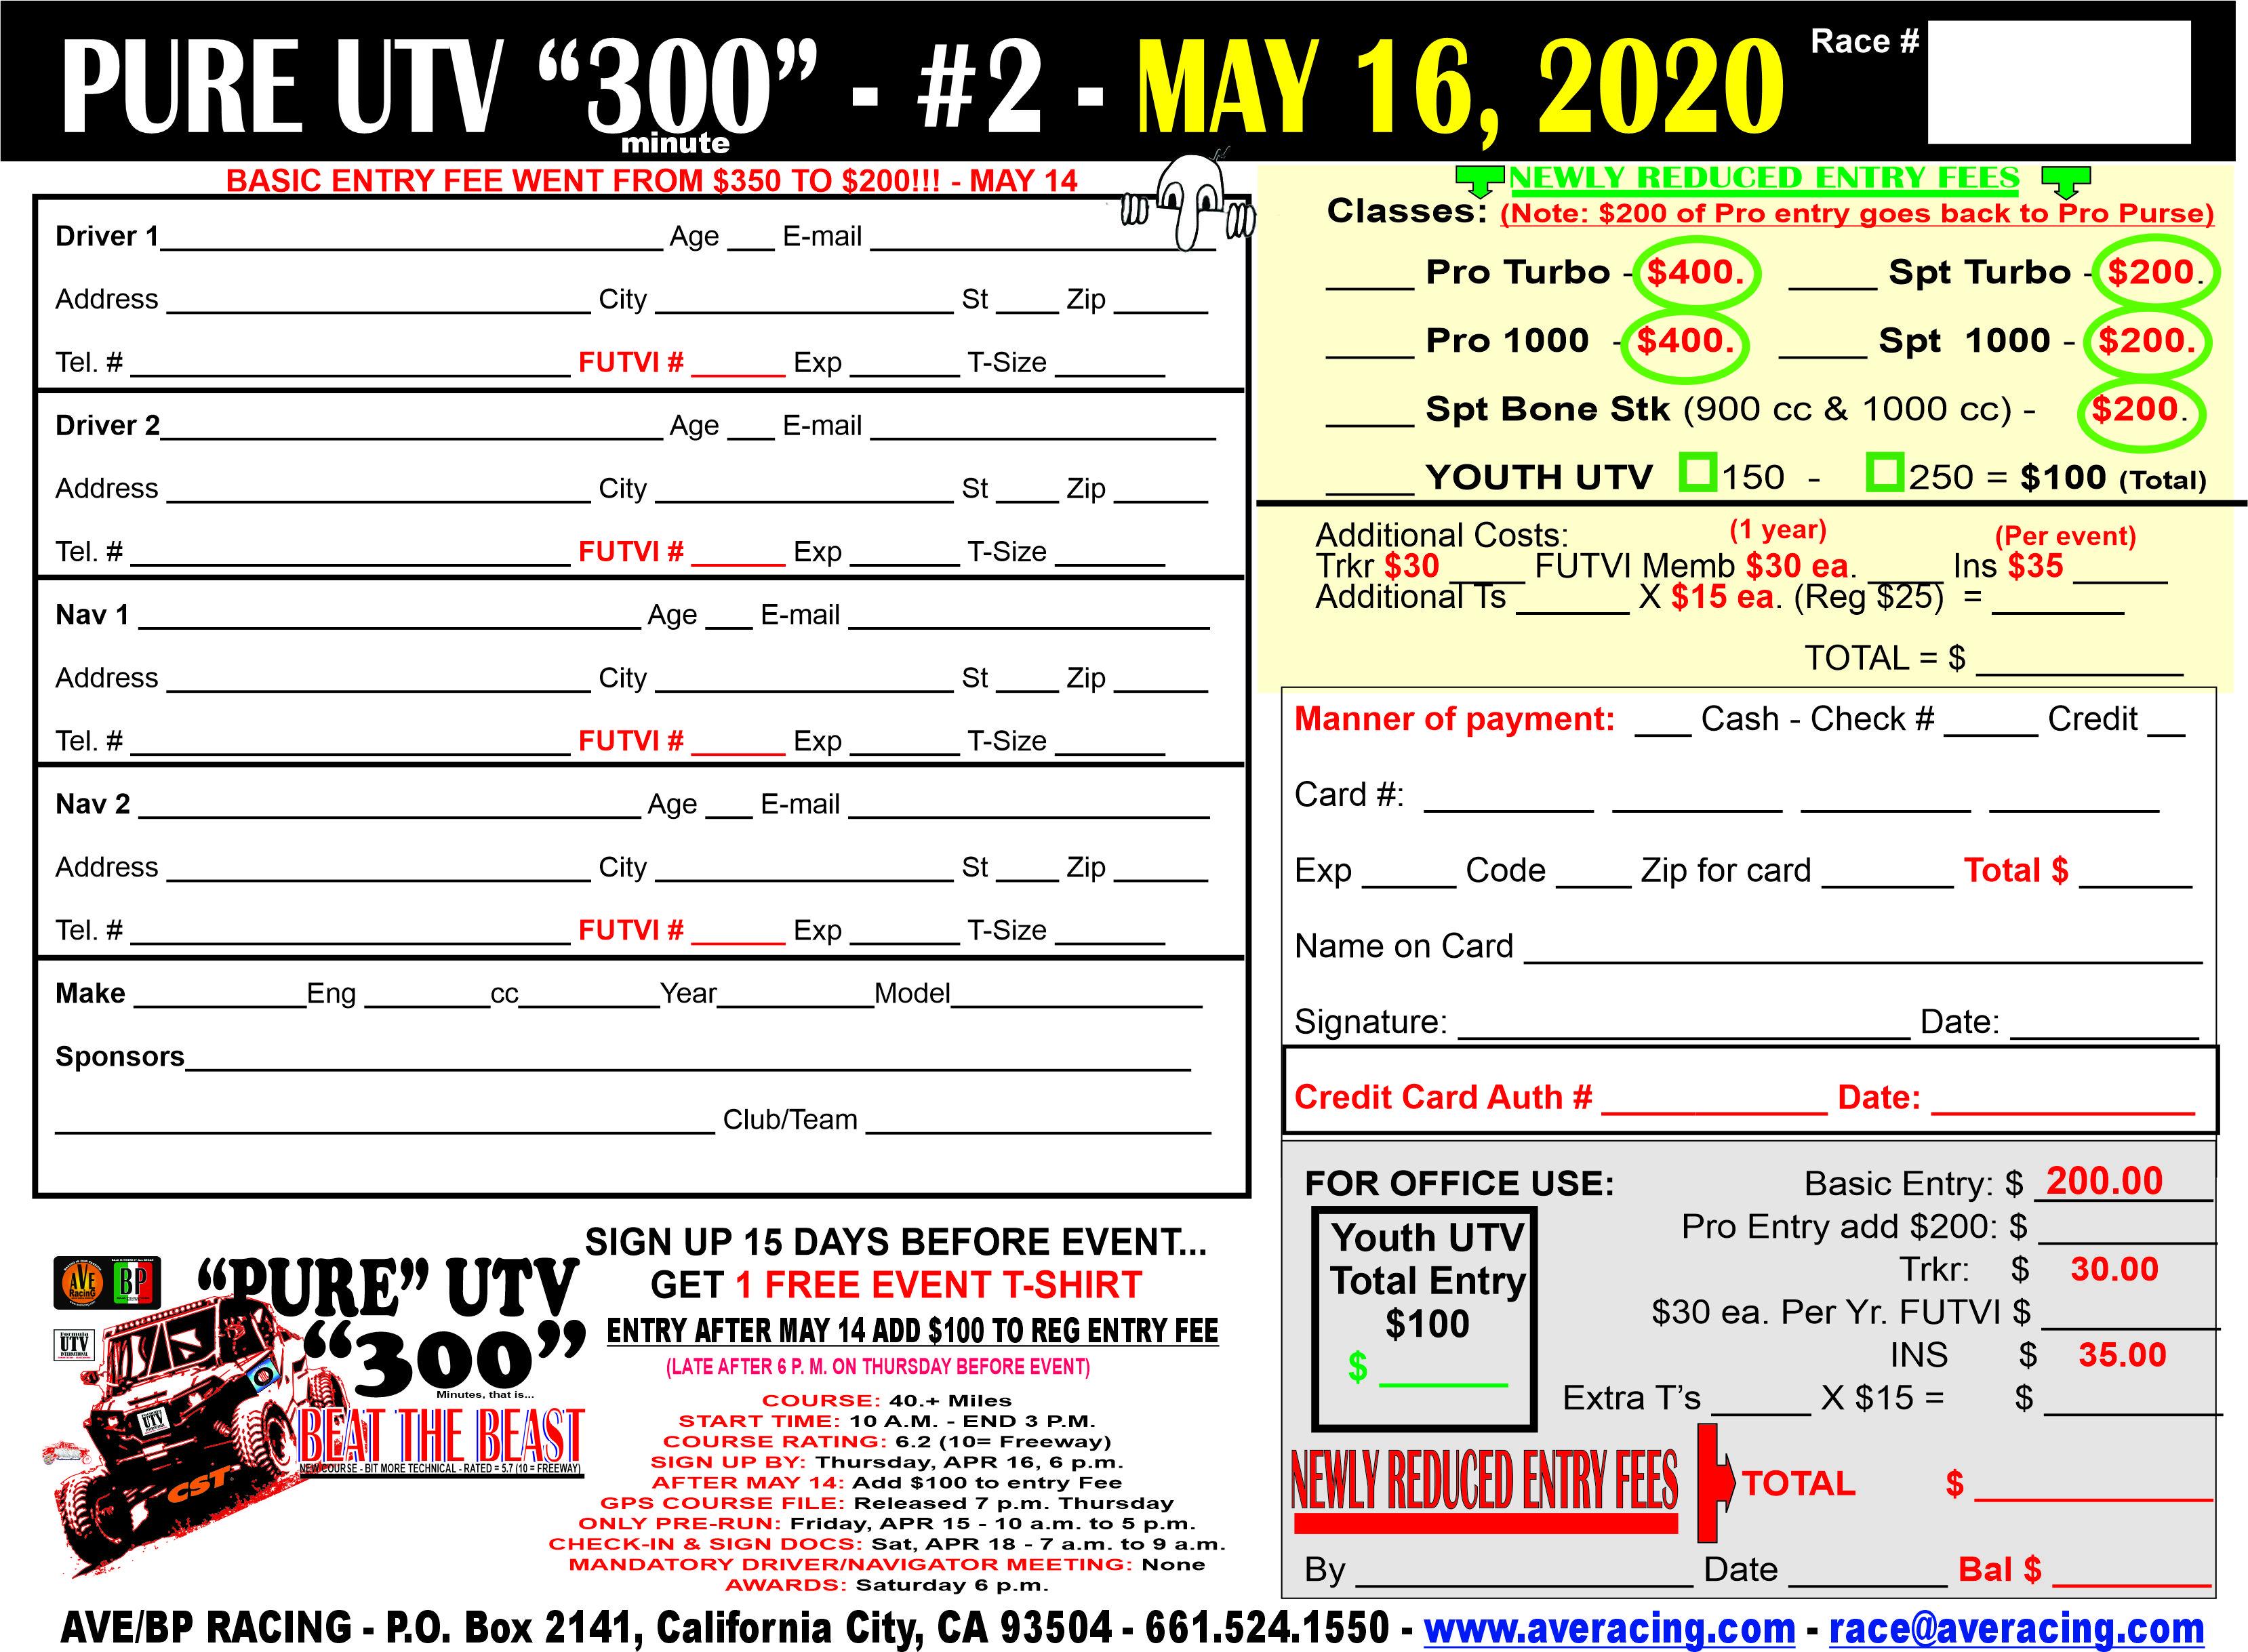 20-P300-#2-REG&YOUTH-ENTRY-UPDATED-X3--APR29.jpg